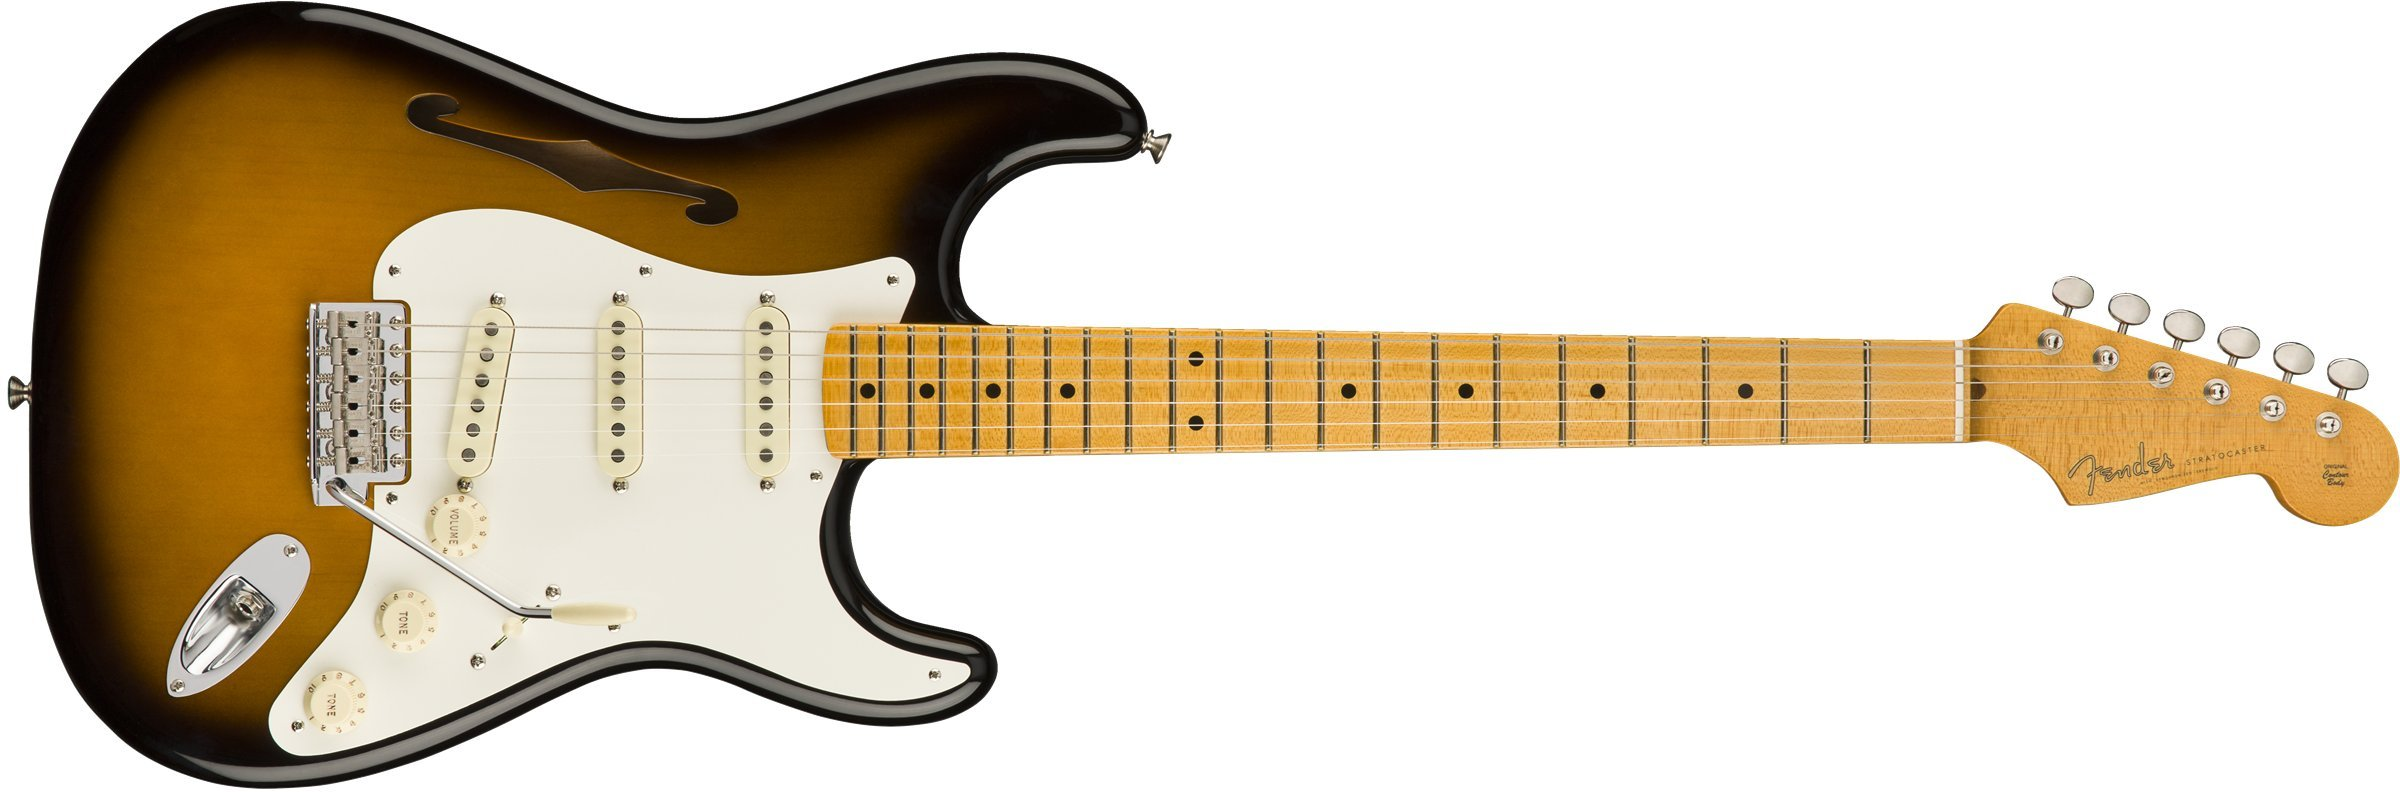 Cheap Fender Eric Johnson Thinline Stratocaster - 2-color Sunburst Black Friday & Cyber Monday 2019